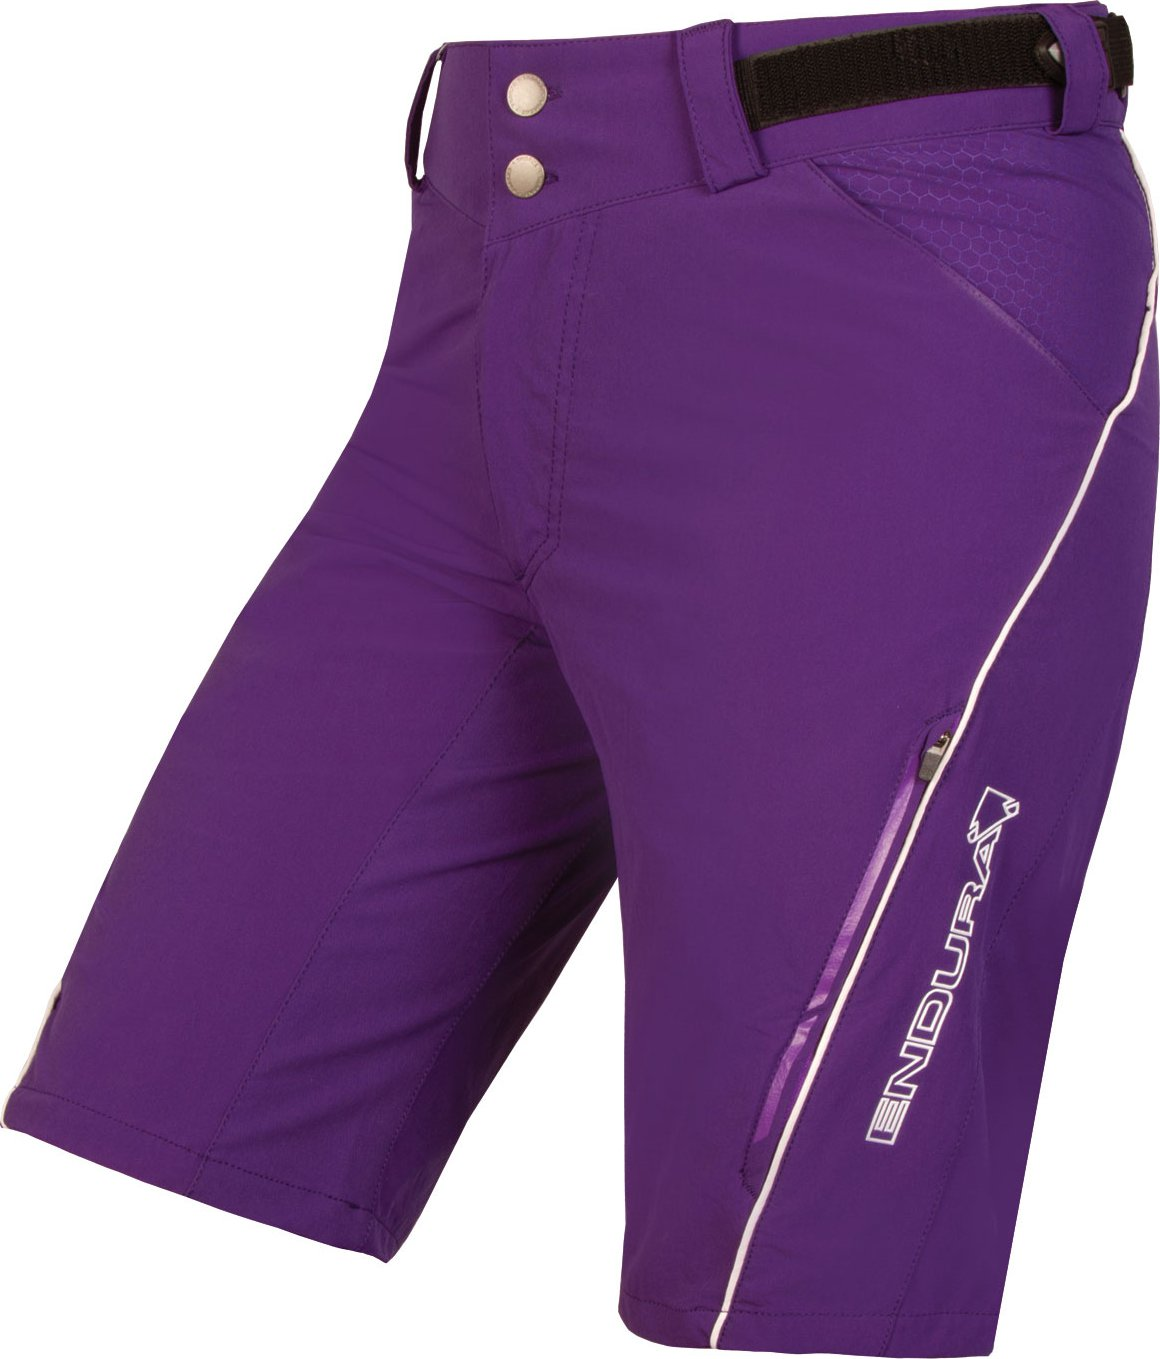 3782e4123d5 Endura Singletrack Lite Purple od 1 149 Kč • Zboží.cz